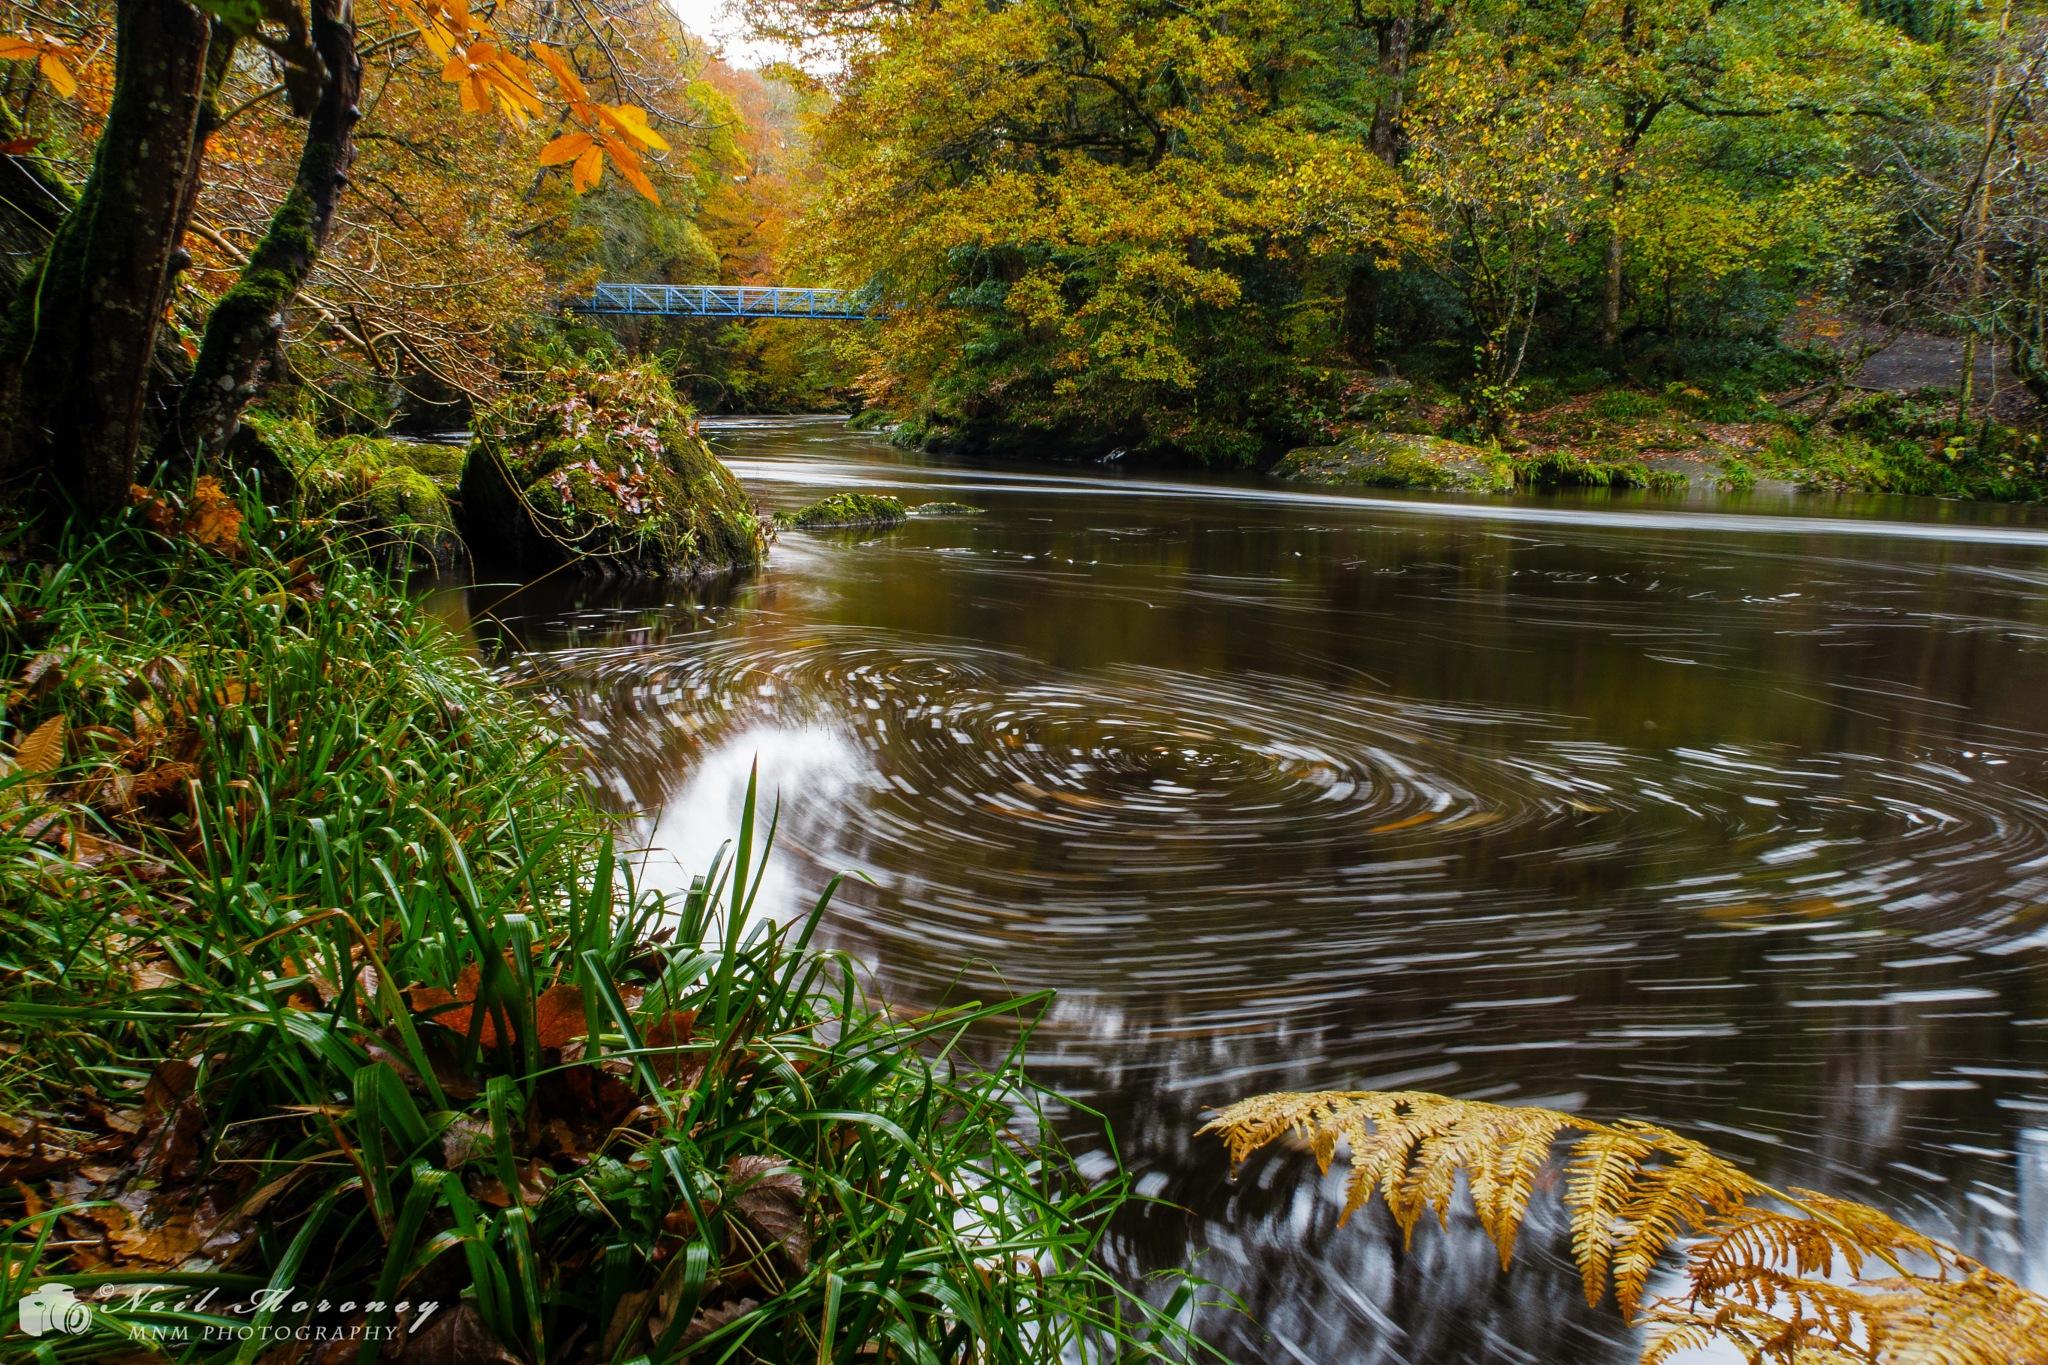 The Swirl. by Neil Moroney